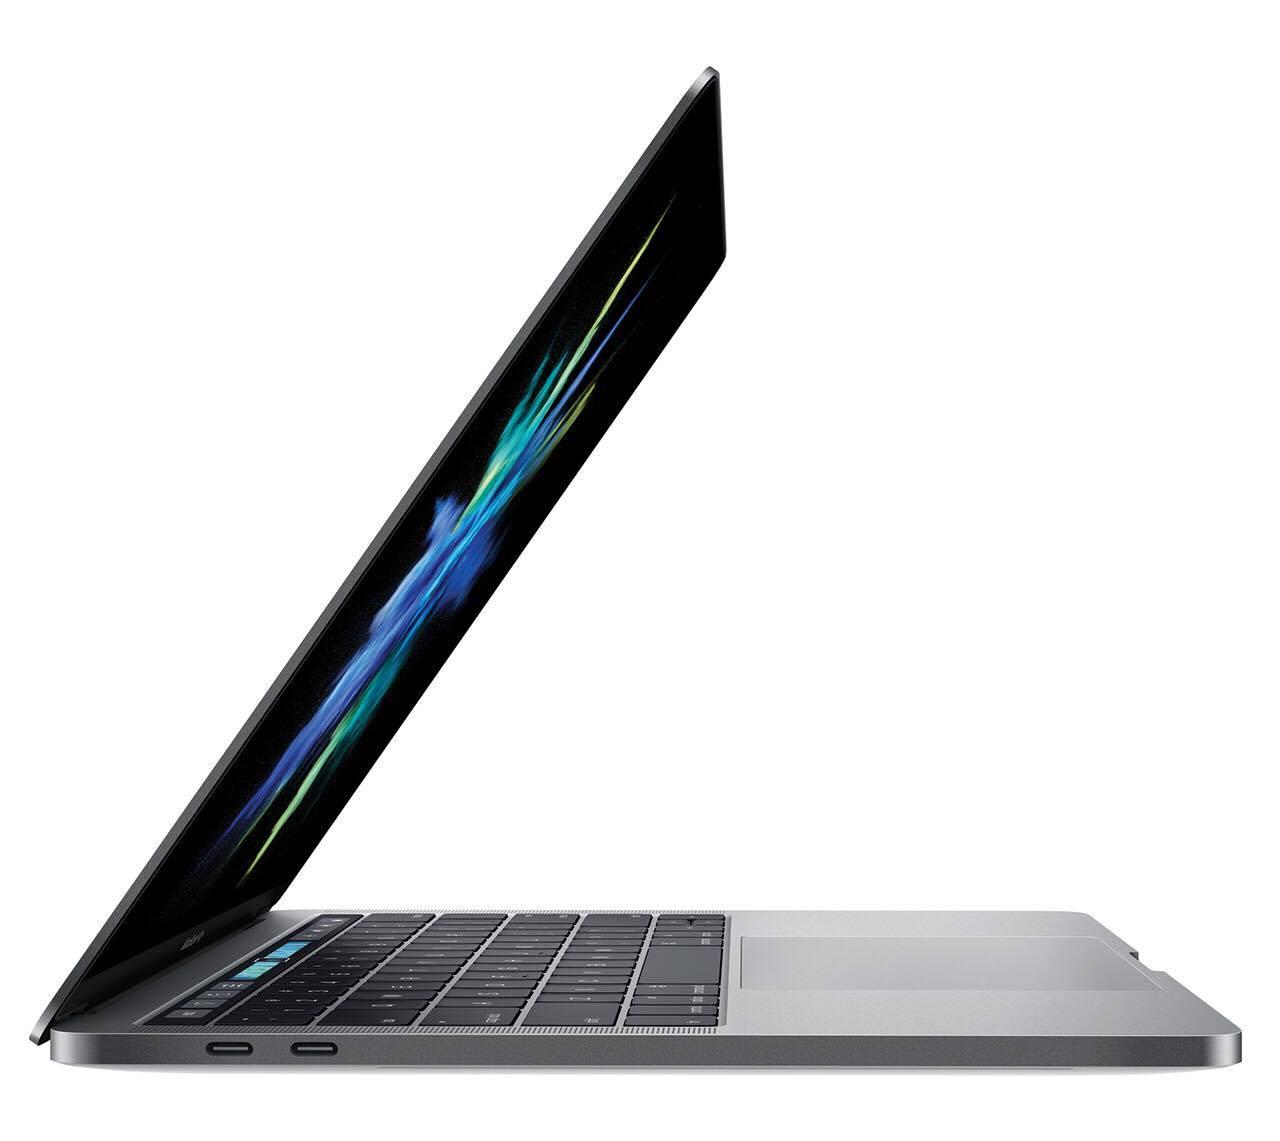 Apple MacBook Pro ports